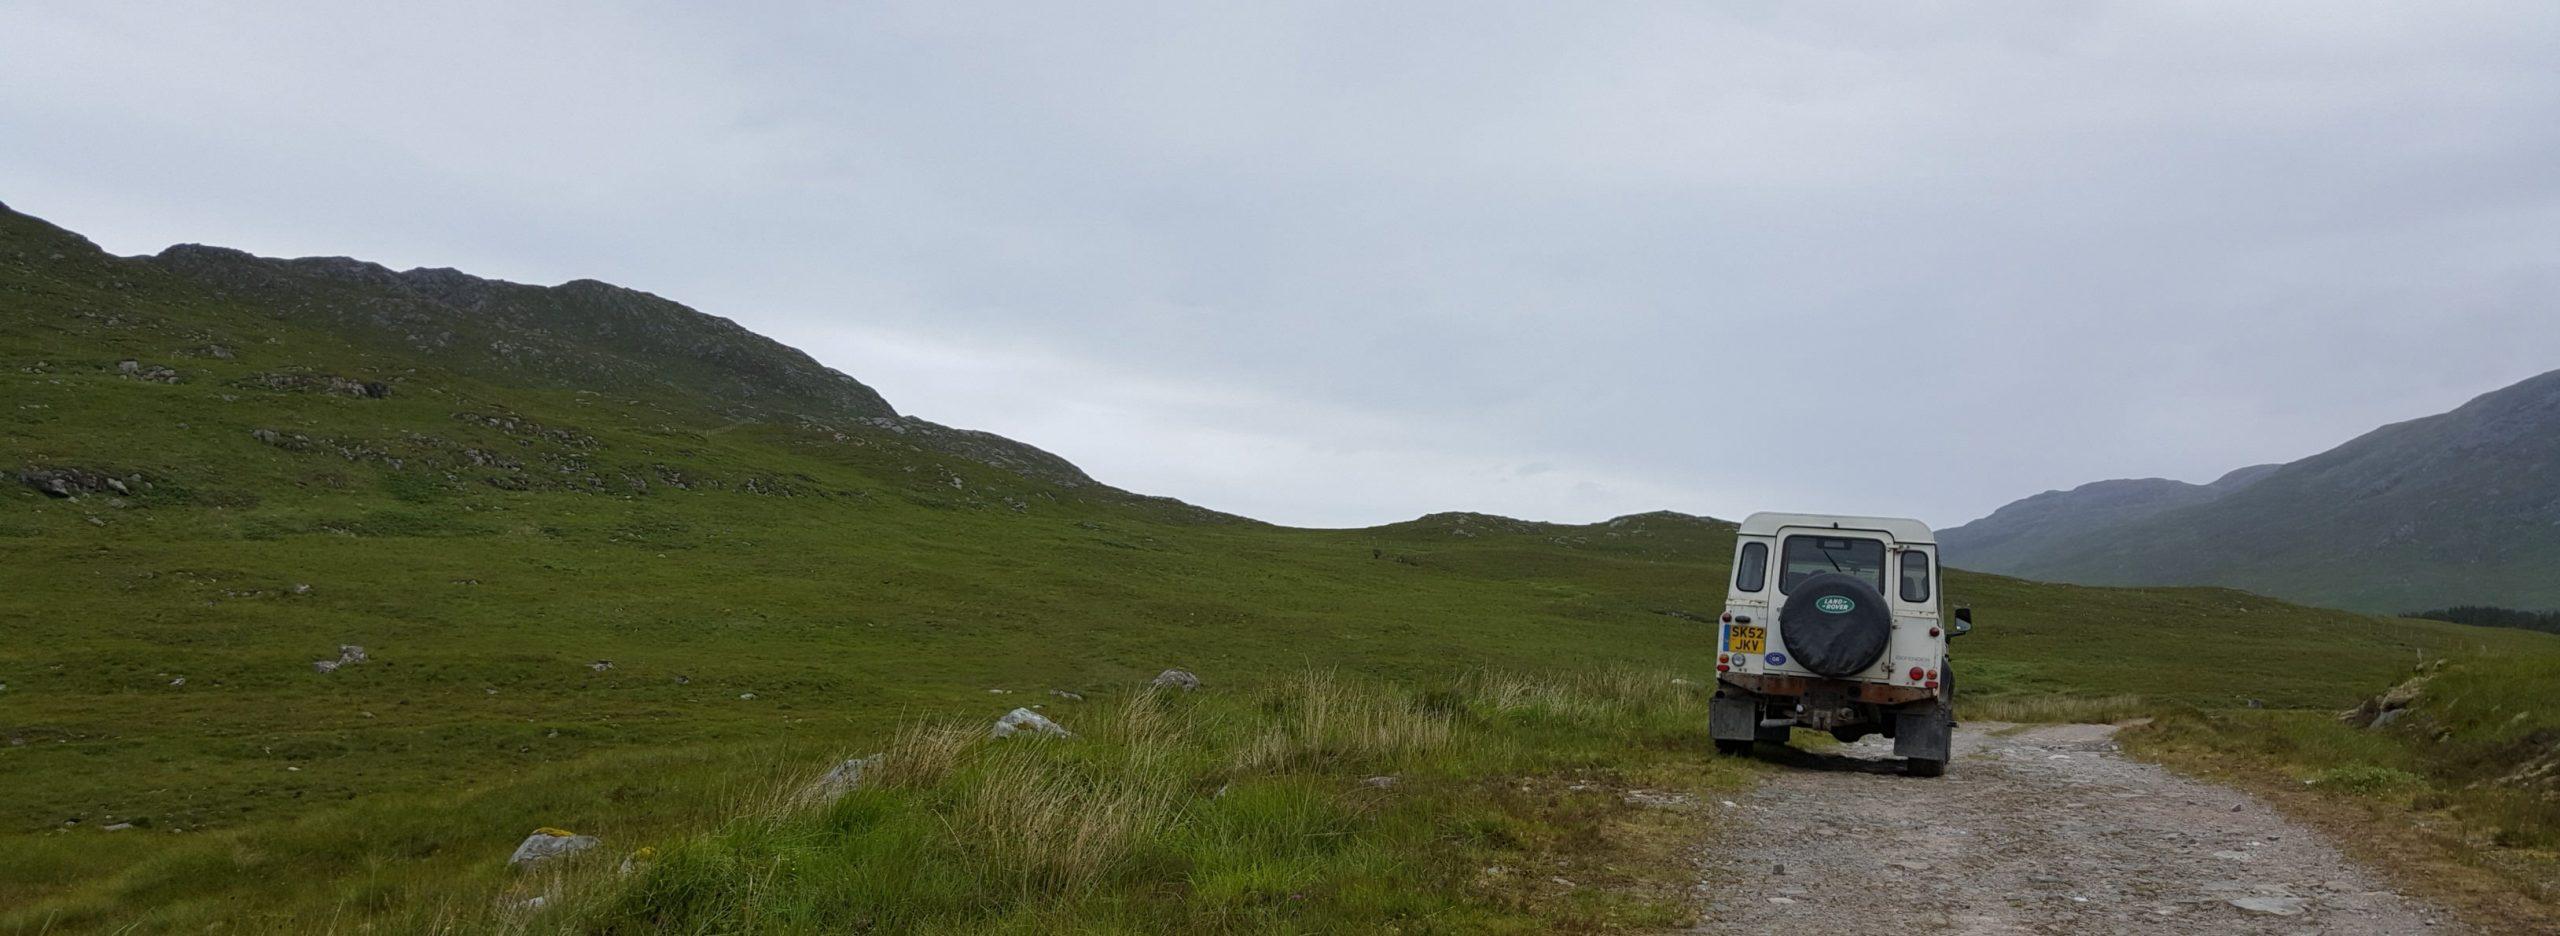 DISCOVERING KNOYDART: SCOTLAND'S LAST TRUE WILDERNESS